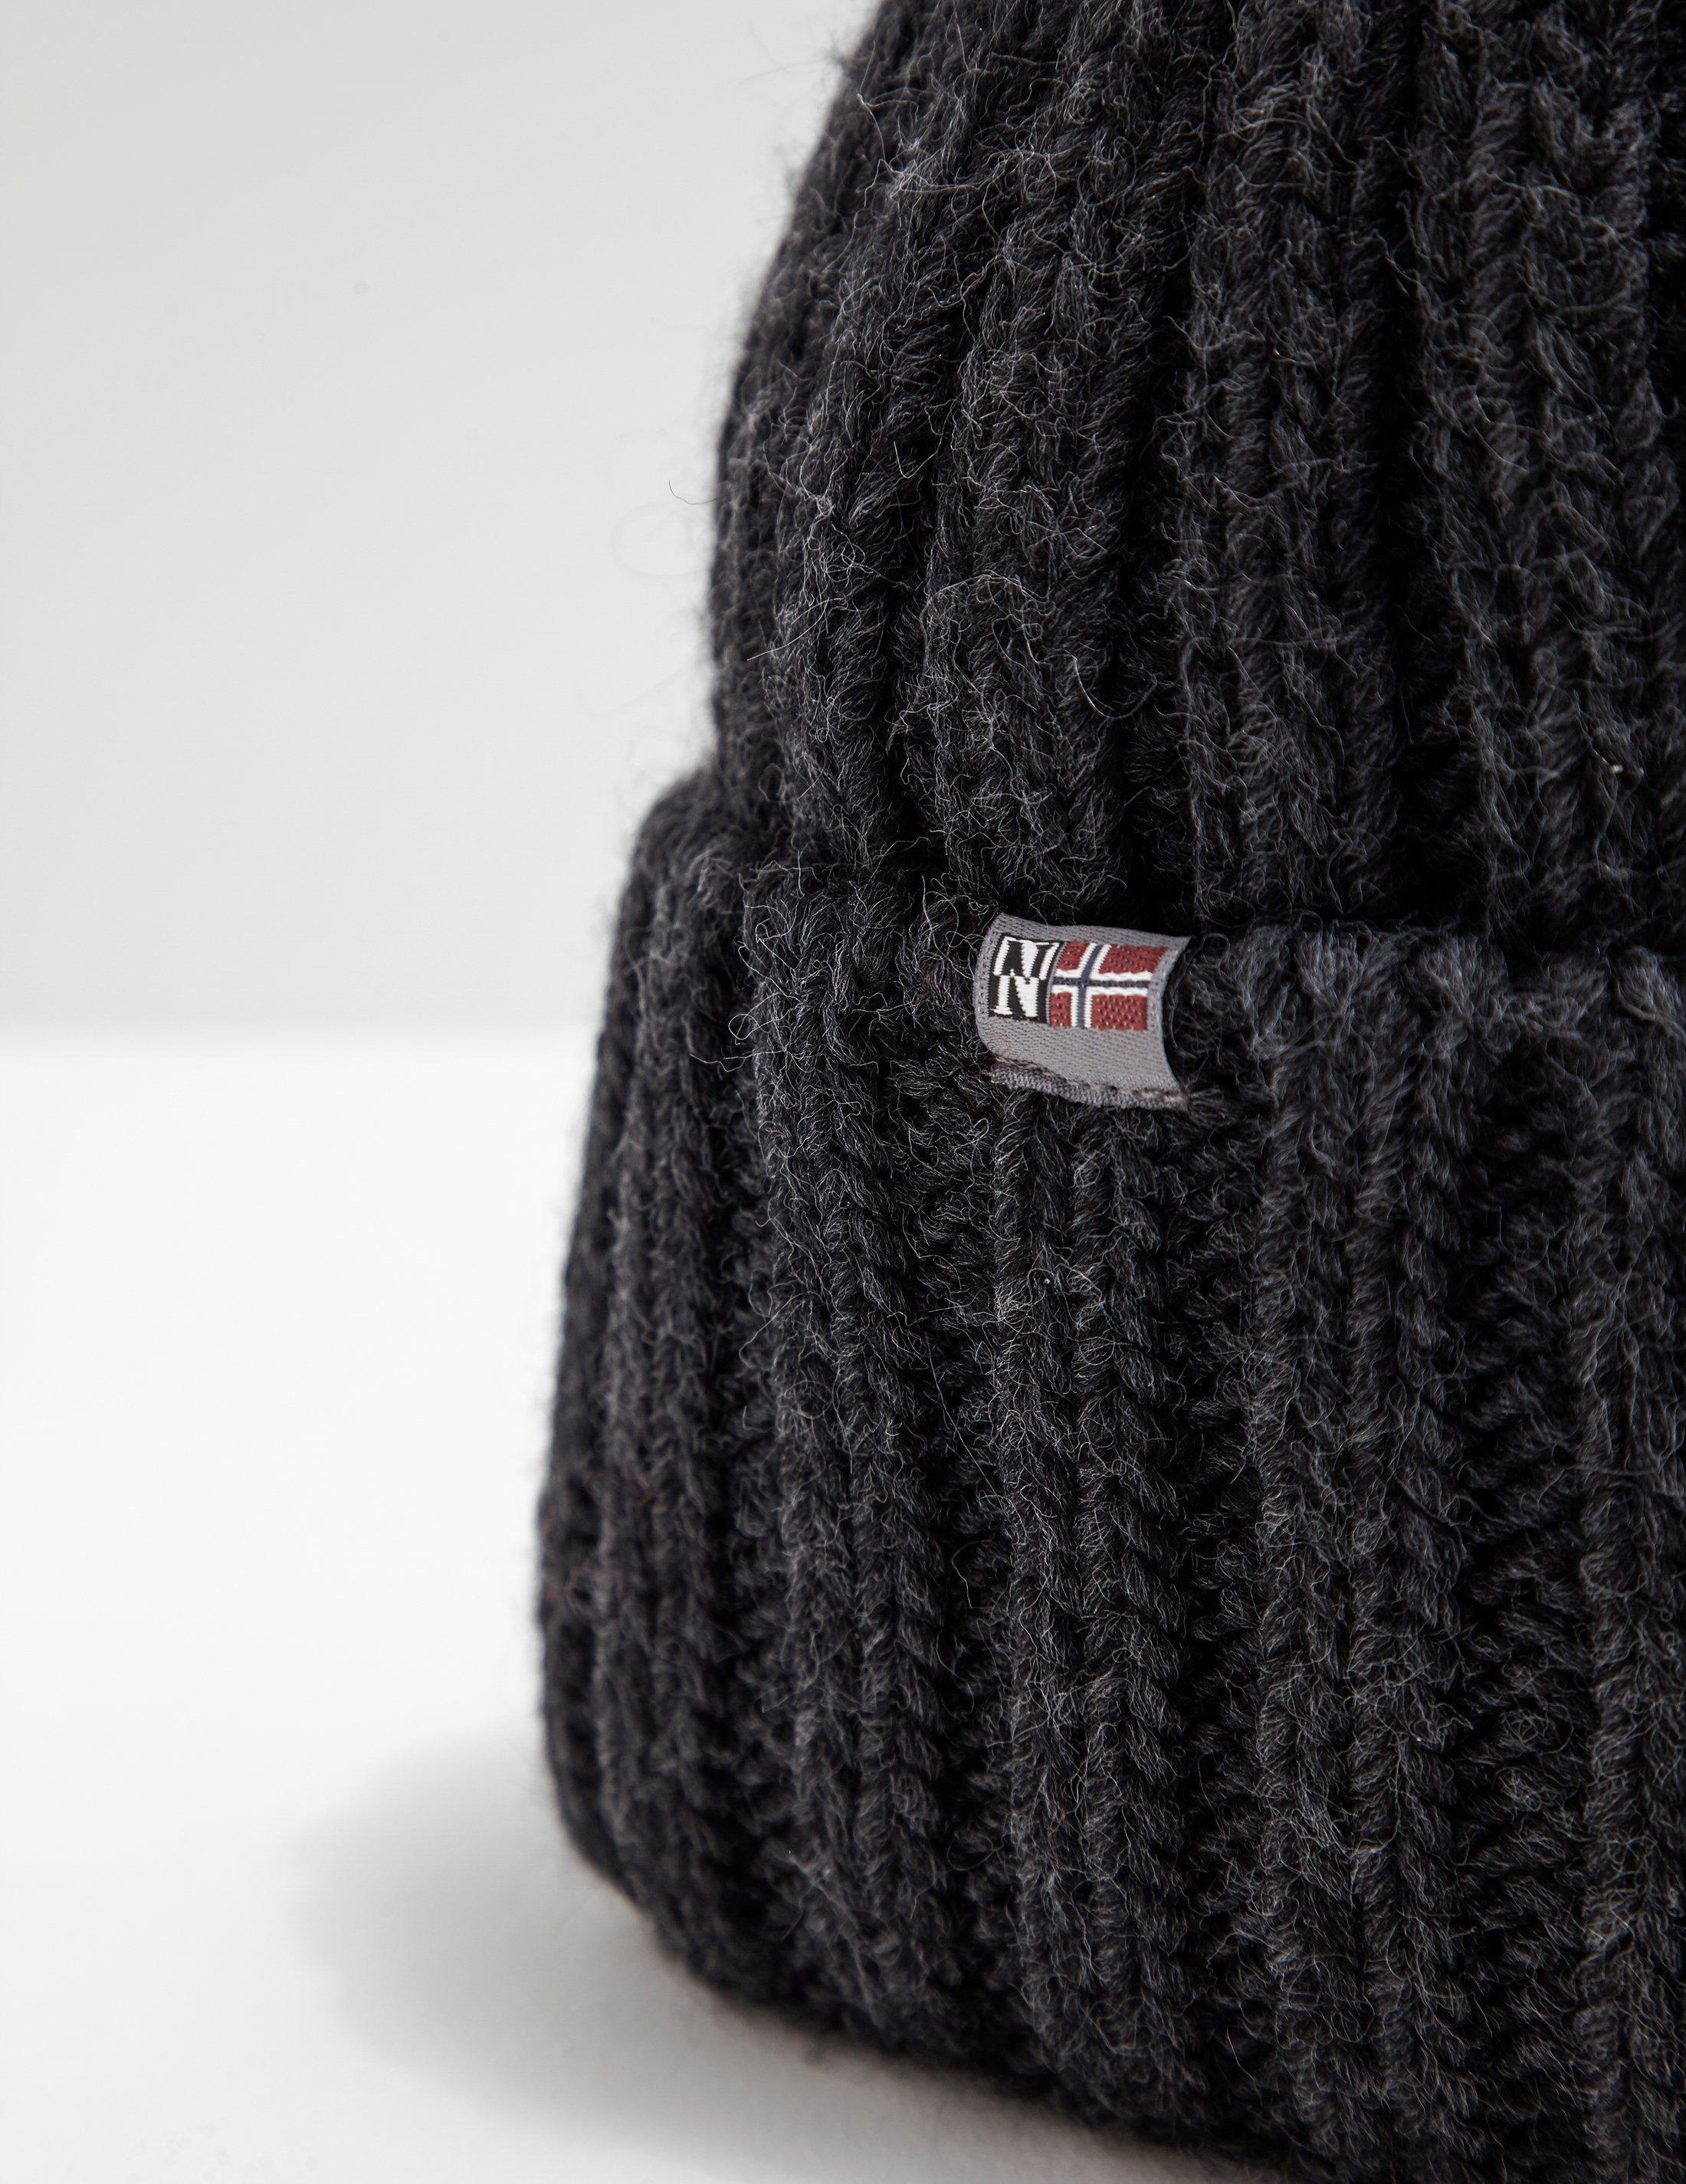 b8edbab21b0 Lyst - Napapijri Mens Semiury Bobble Hat Grey in Gray for Men